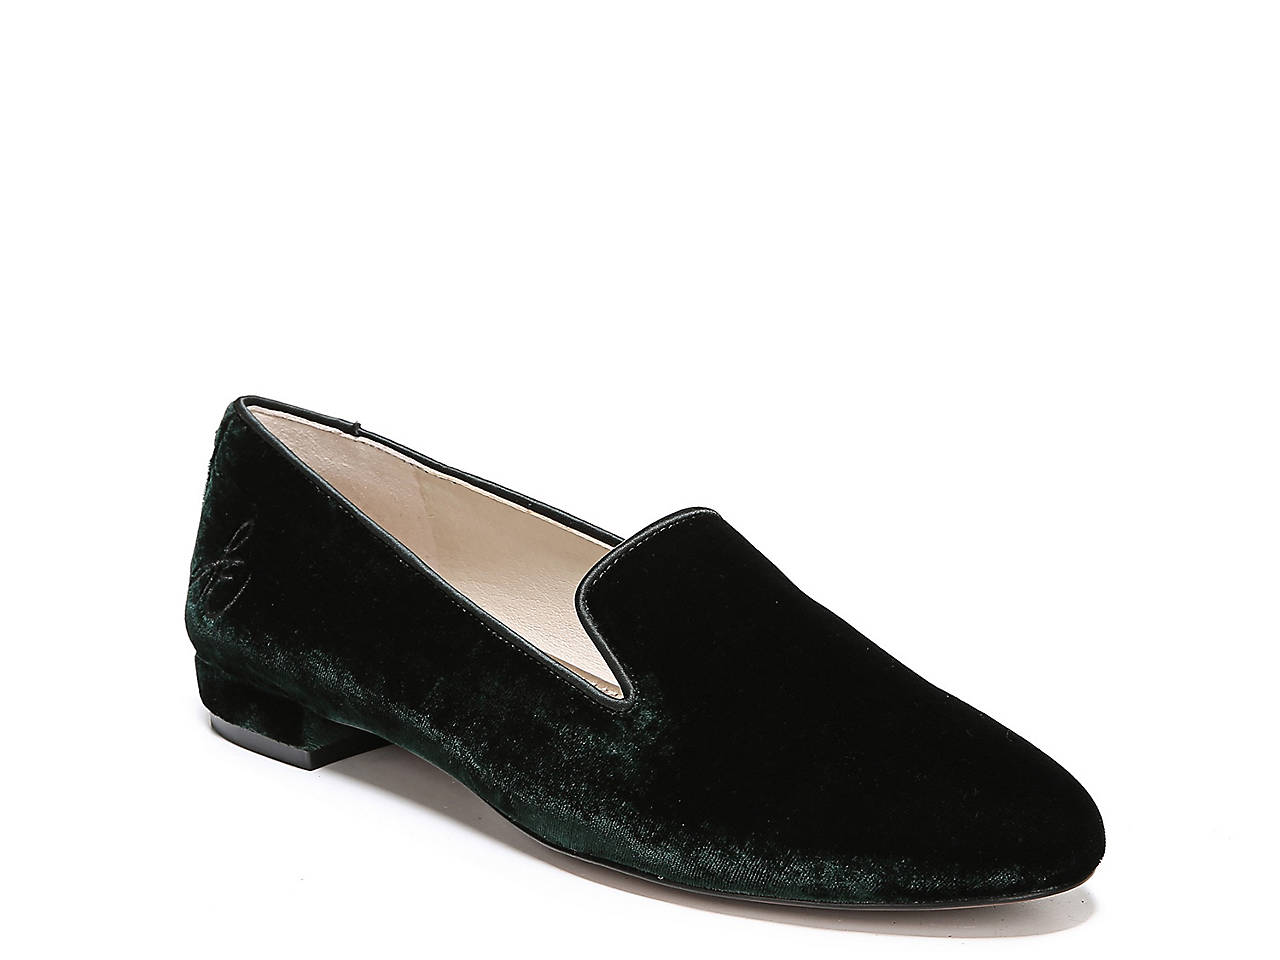 0f2dc033716f Sam Edelman Jordy Loafer Women s Shoes